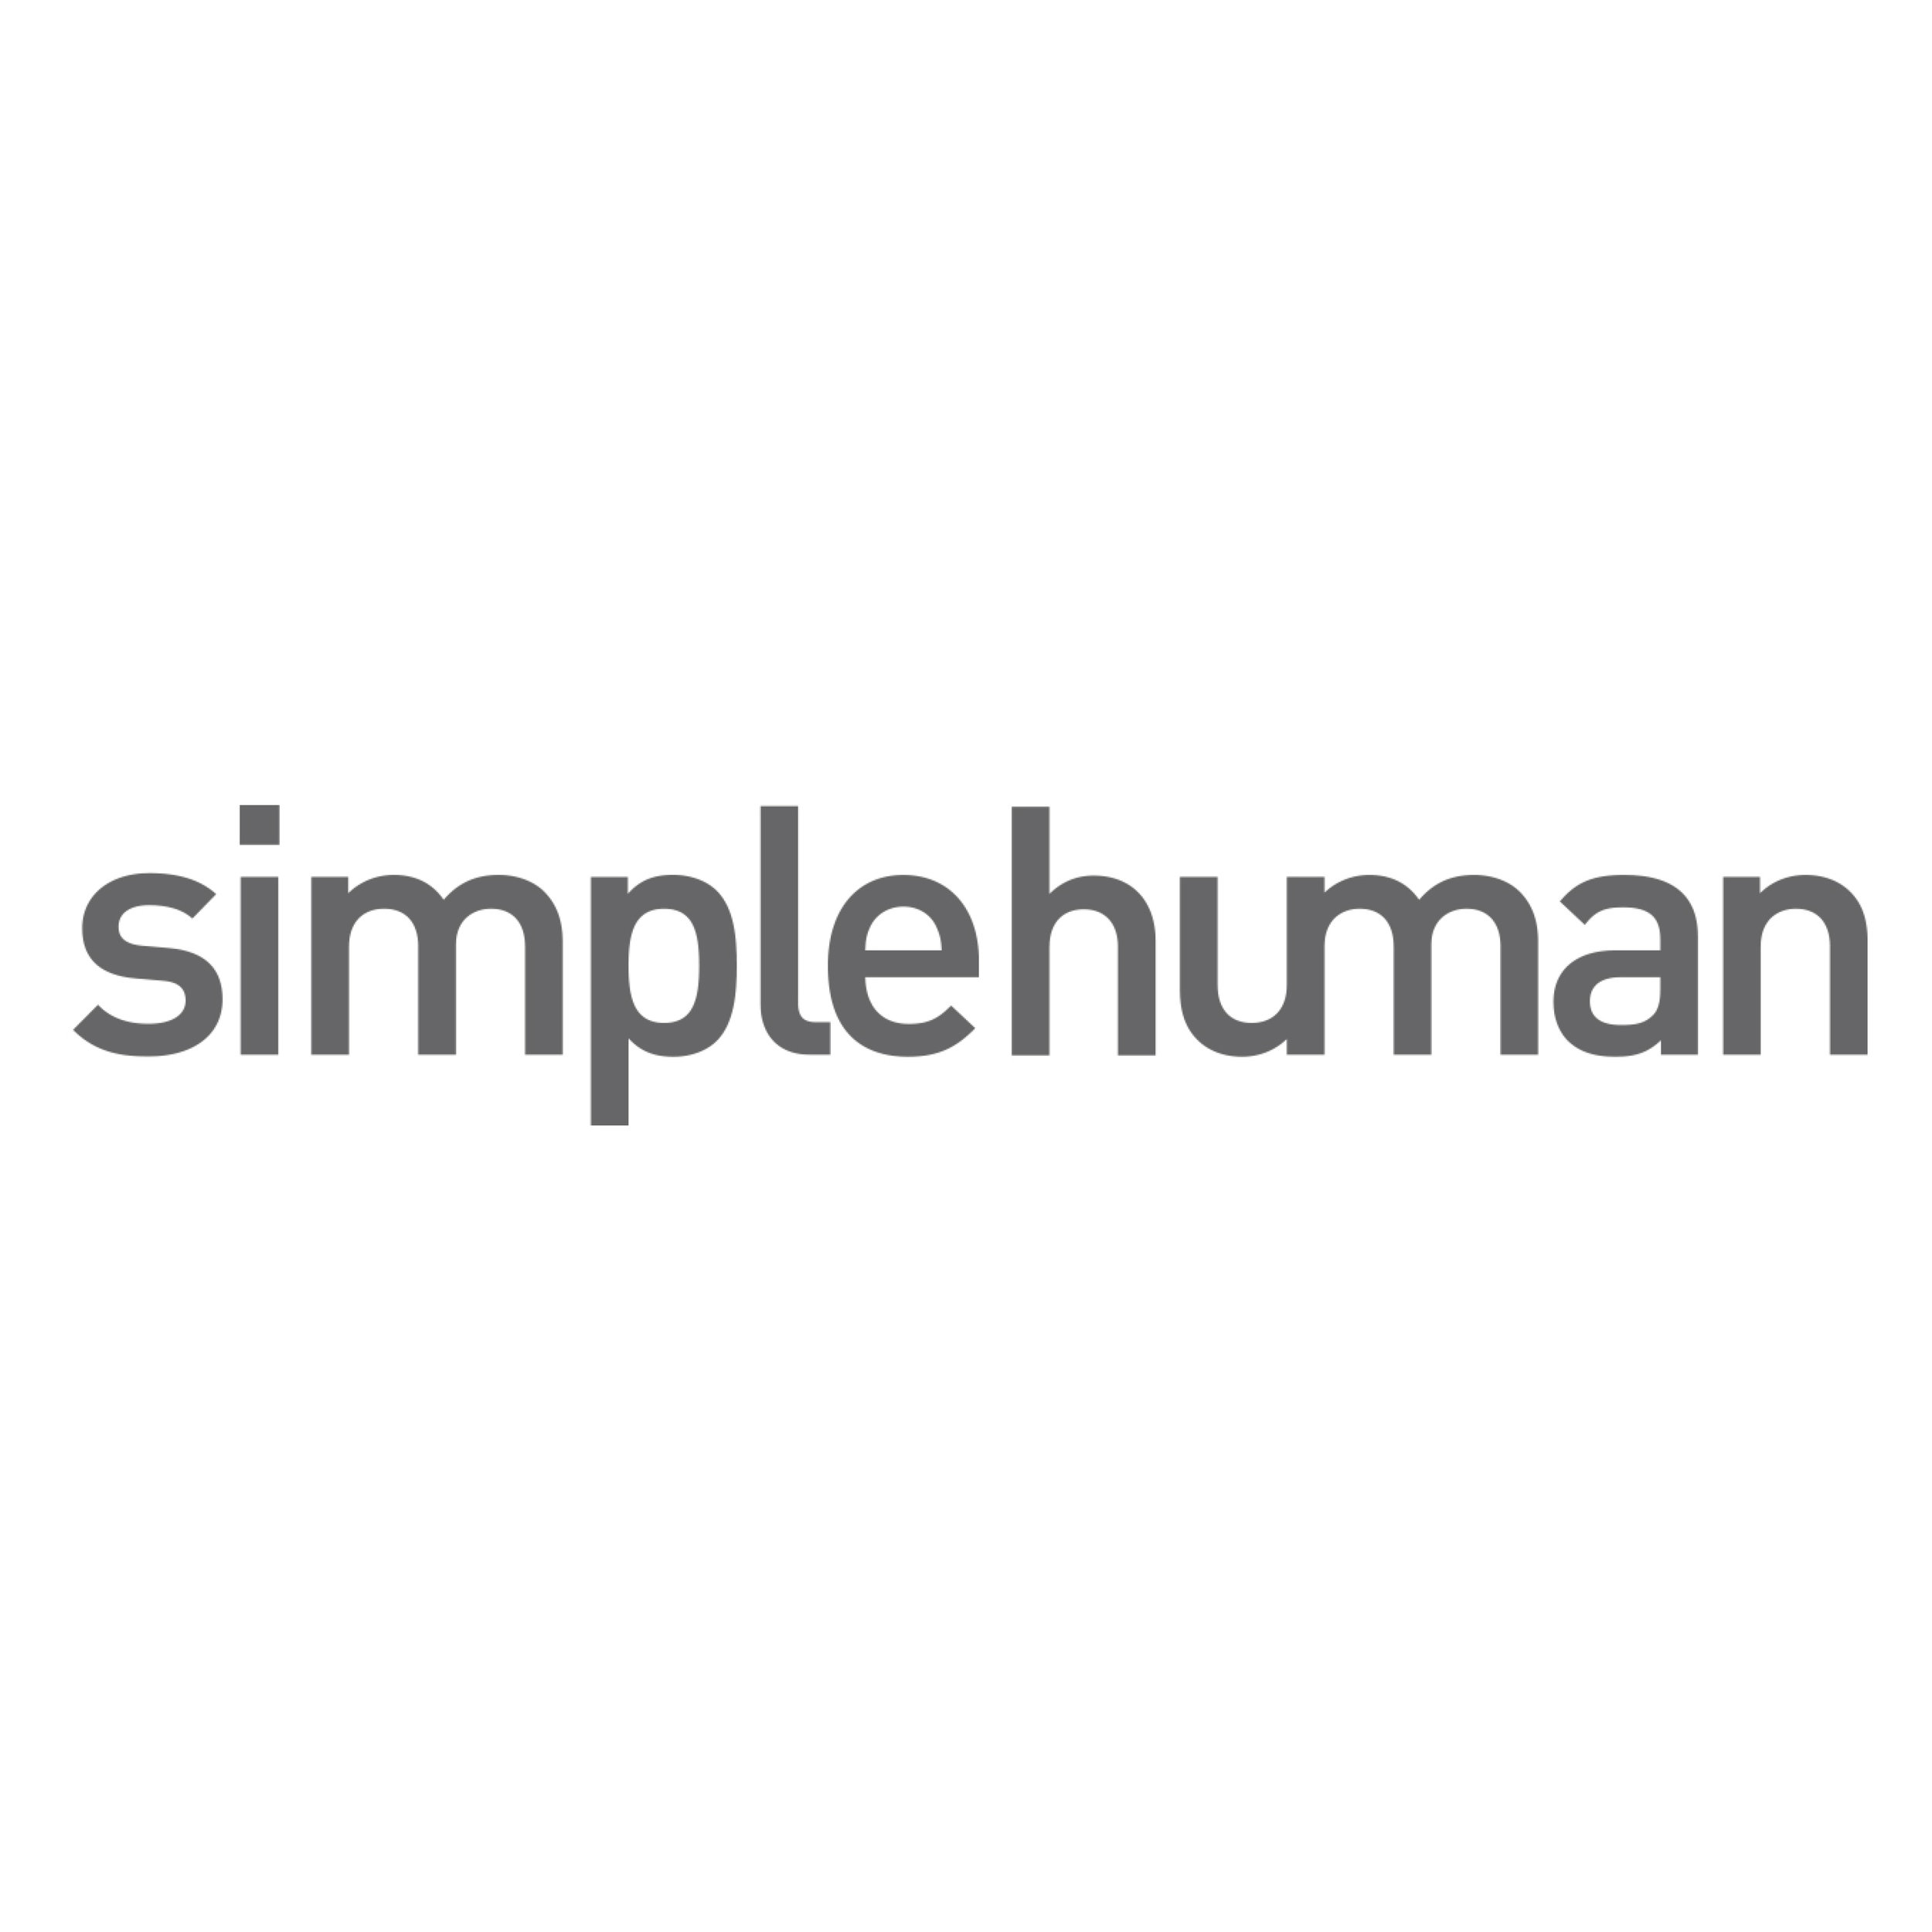 Simple Human.jpg